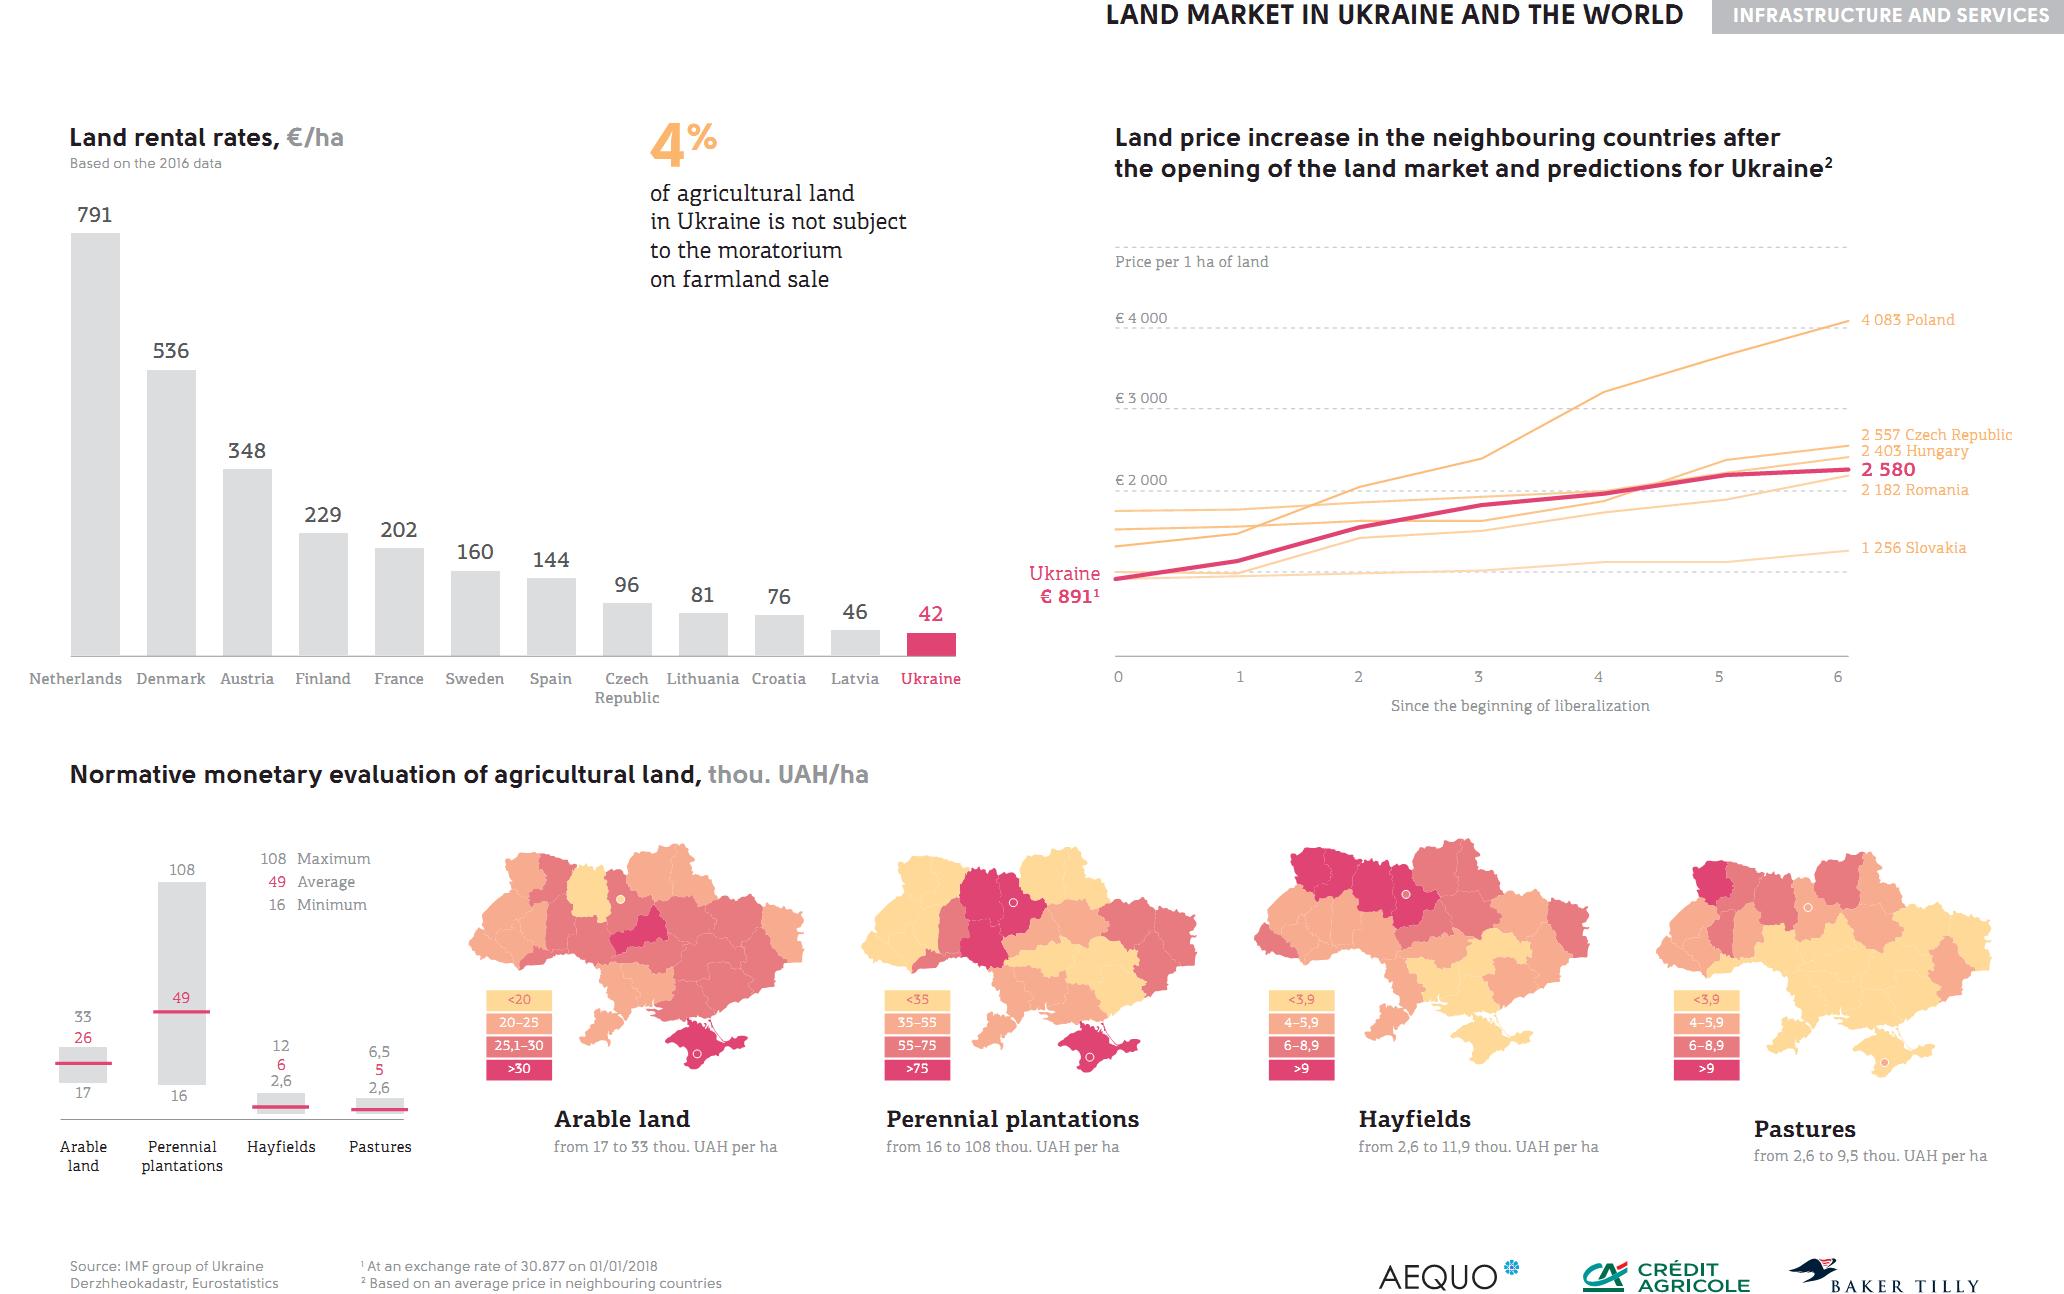 Farmland market in Ukraine and the world (click for full resolution)